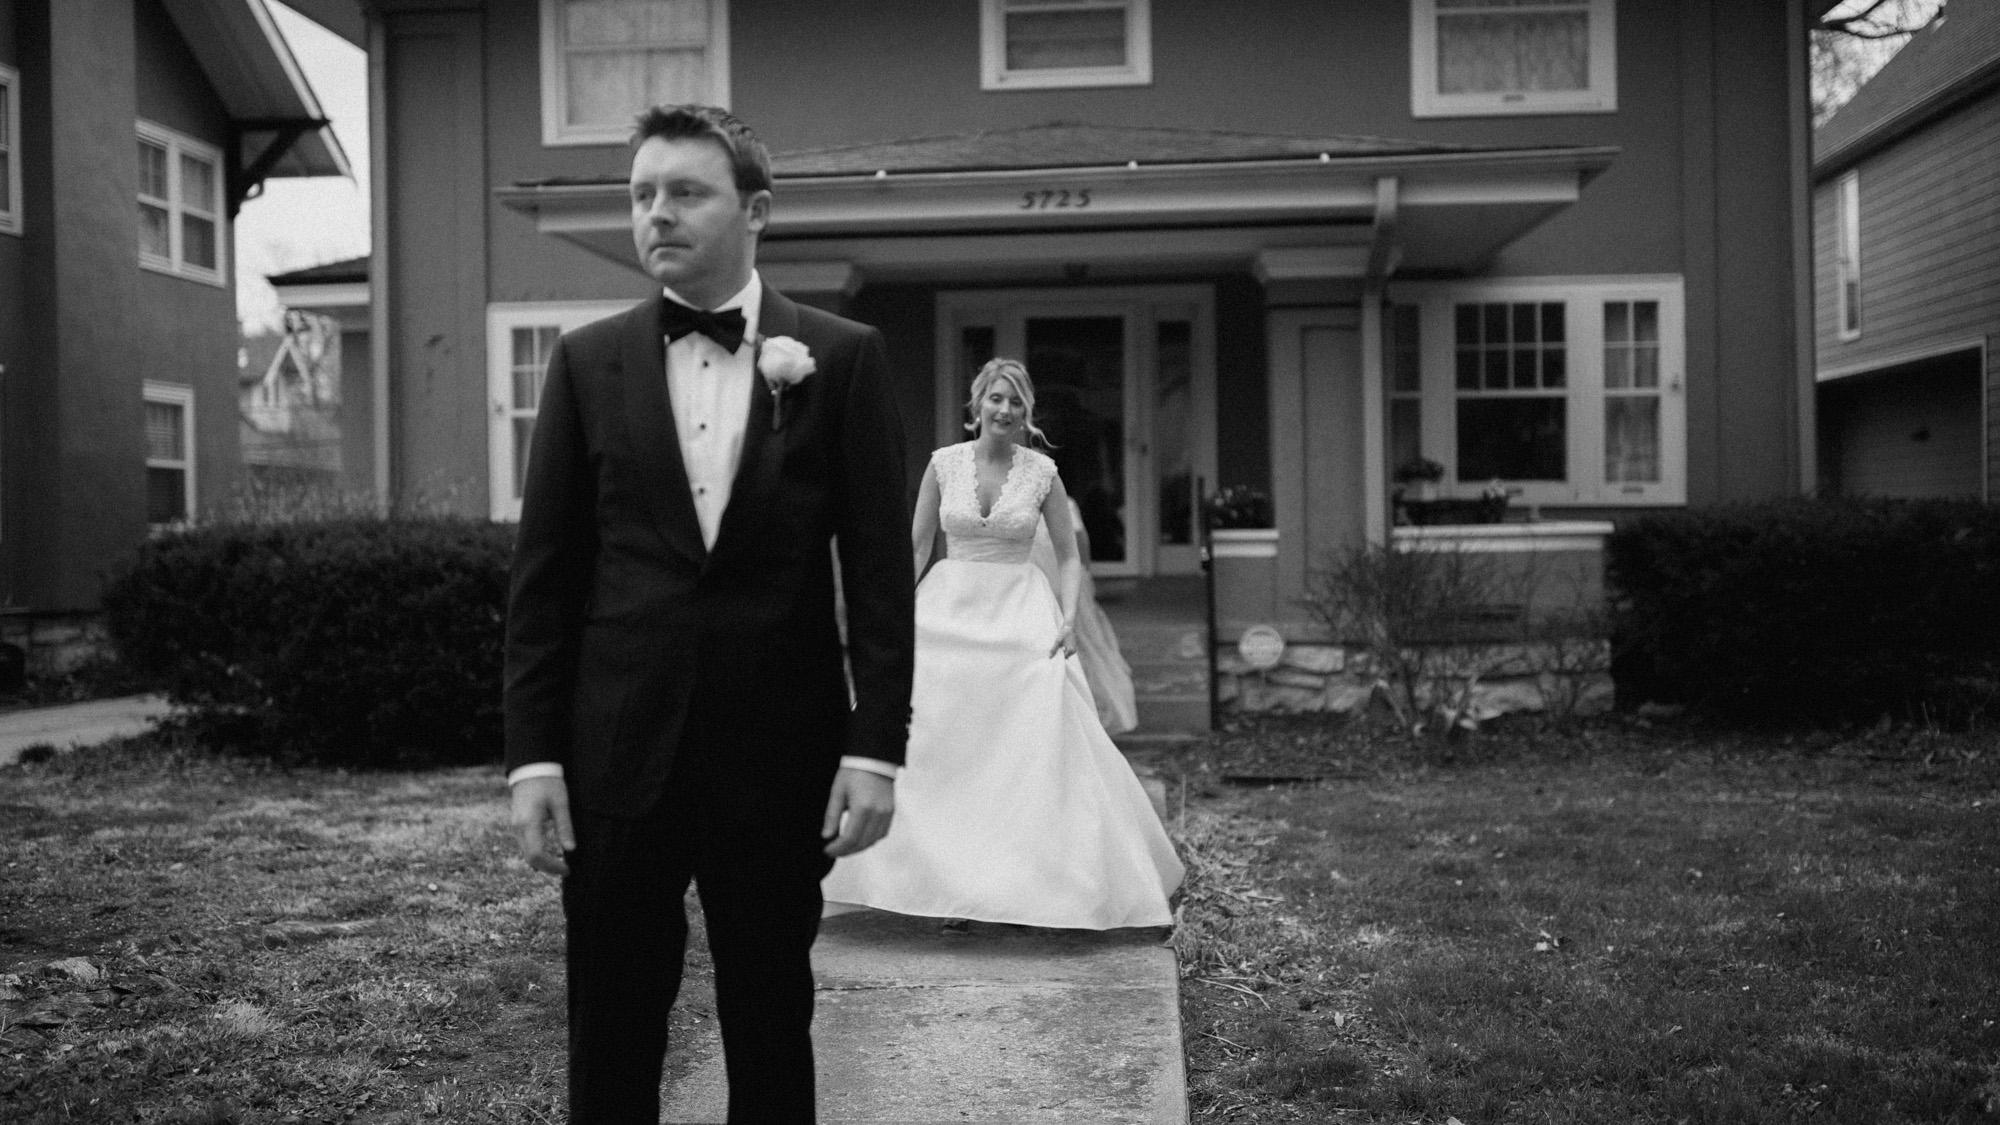 Alec_Vanderboom_kansas_city_hip_wedding_photos-0025.jpg